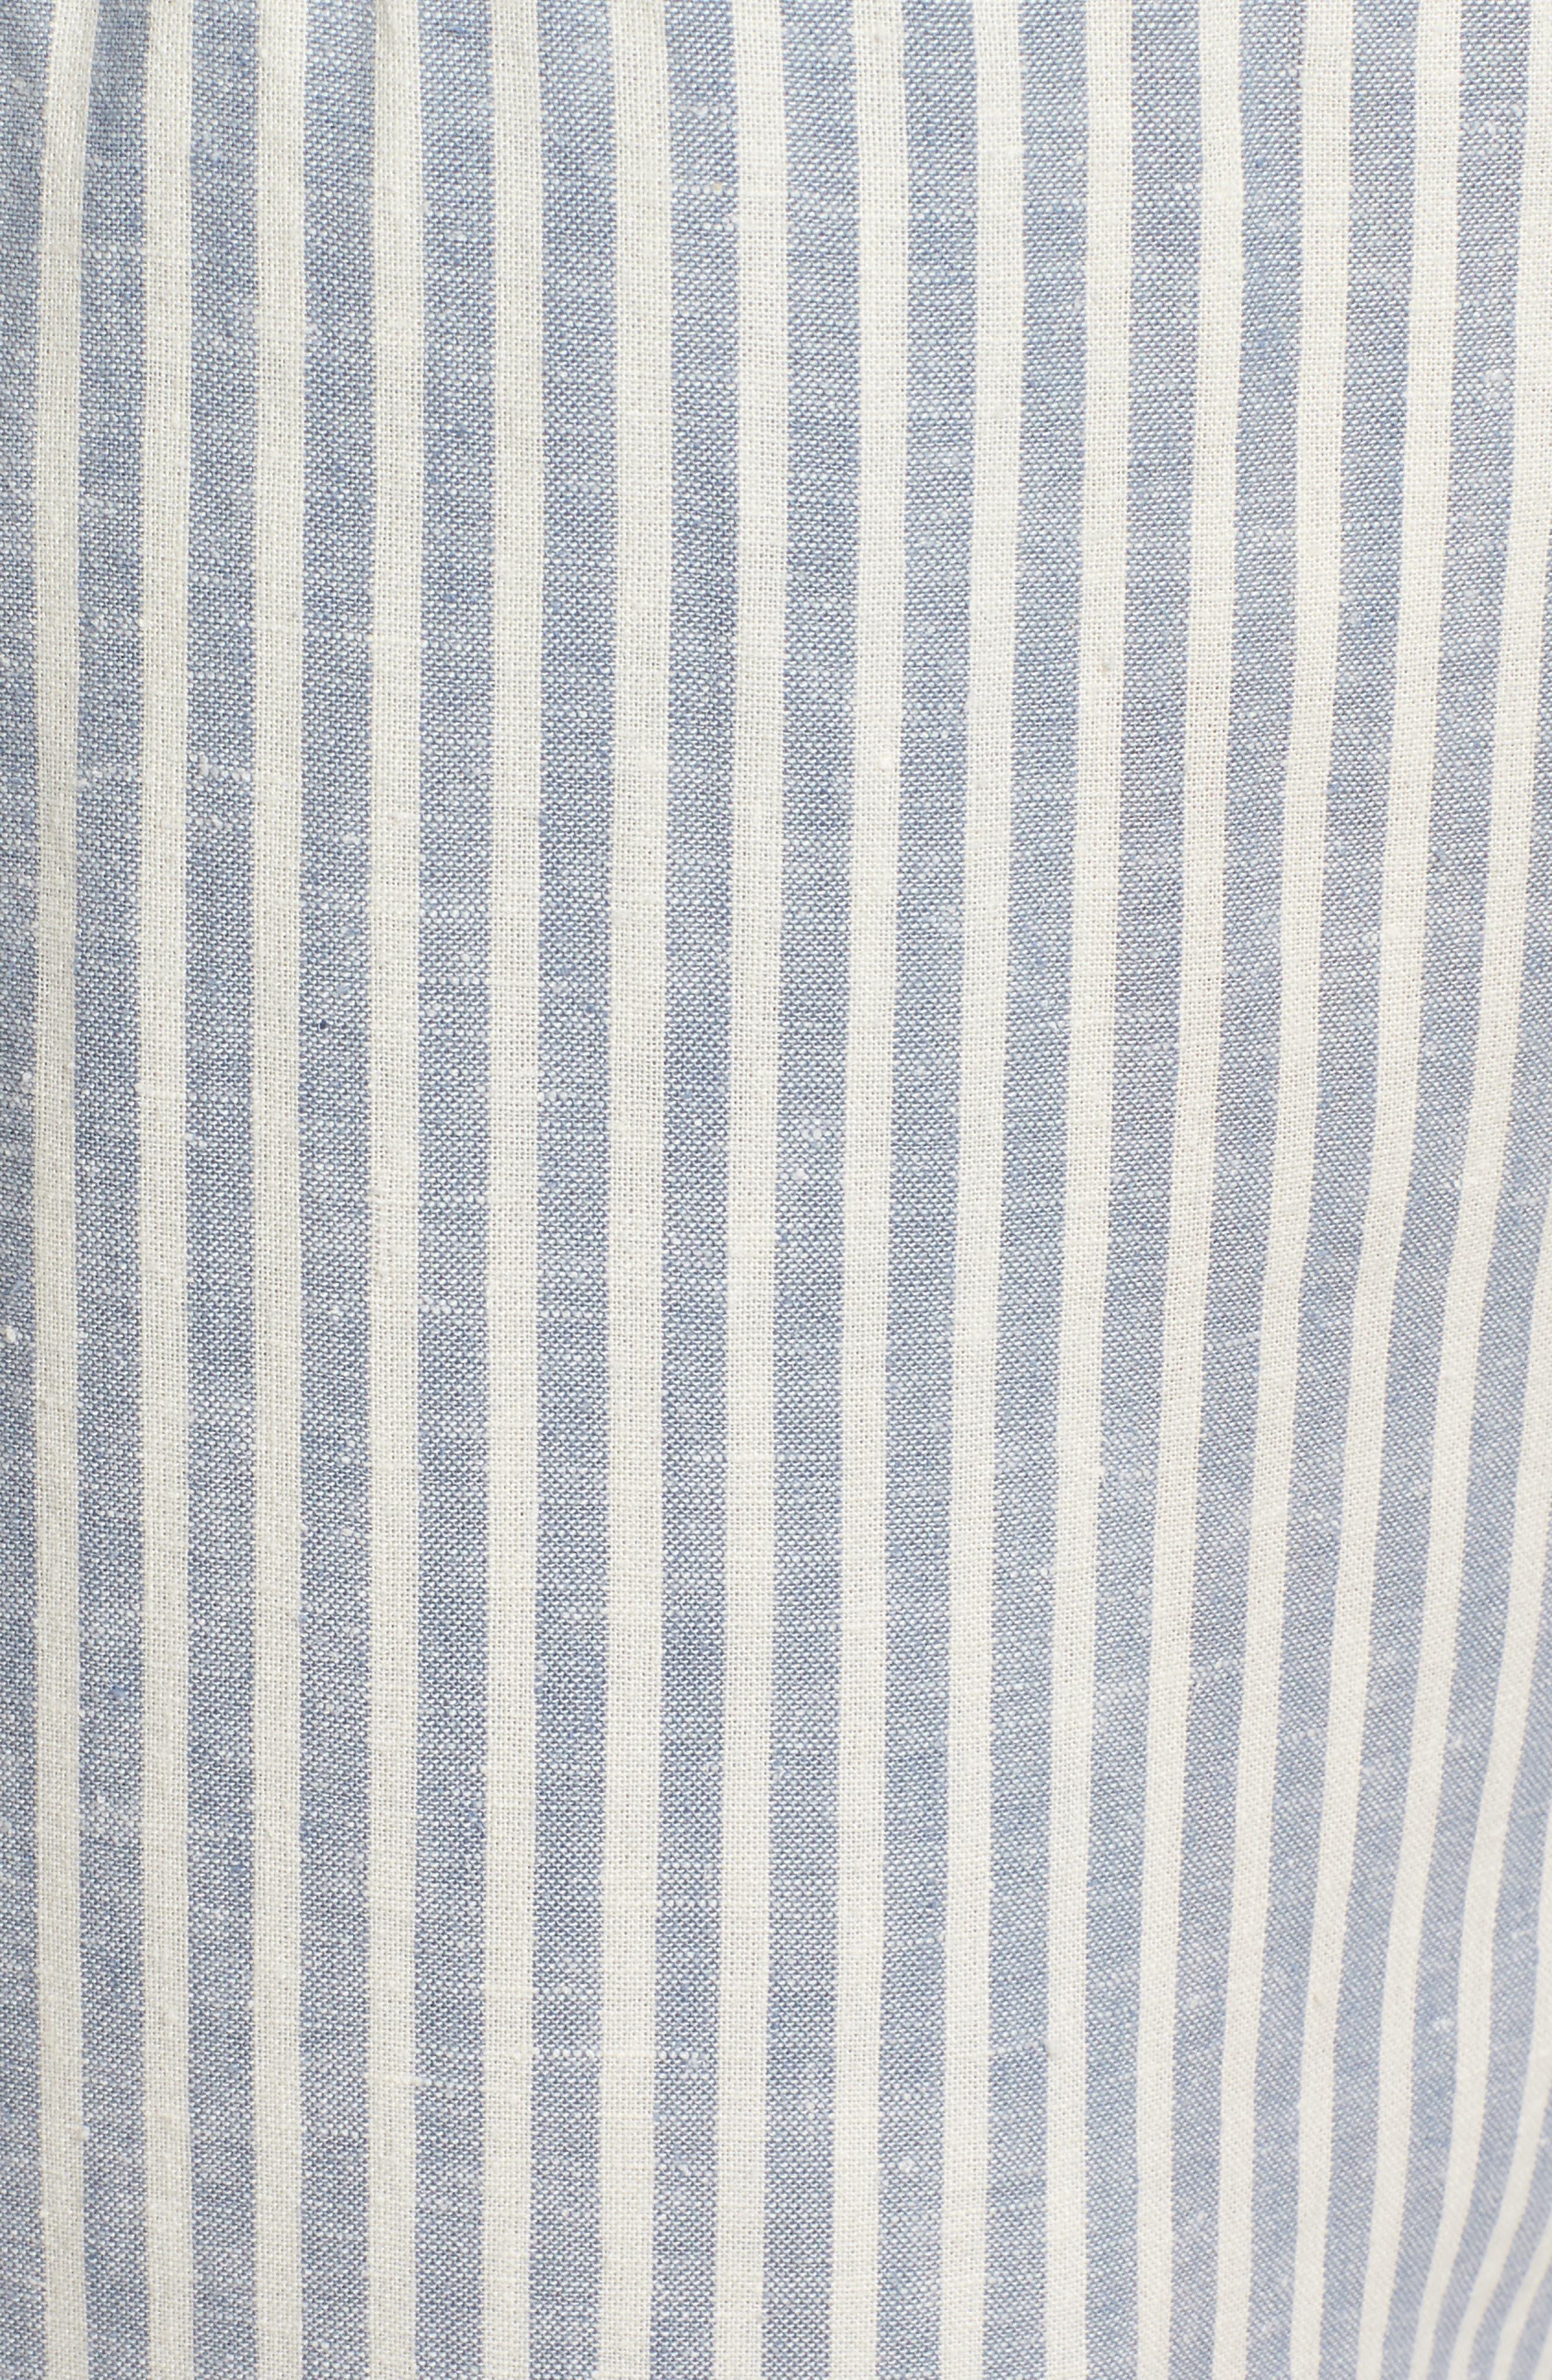 Stripe Tapered Hemp Blend Ankle Pants,                             Alternate thumbnail 6, color,                             Chambray